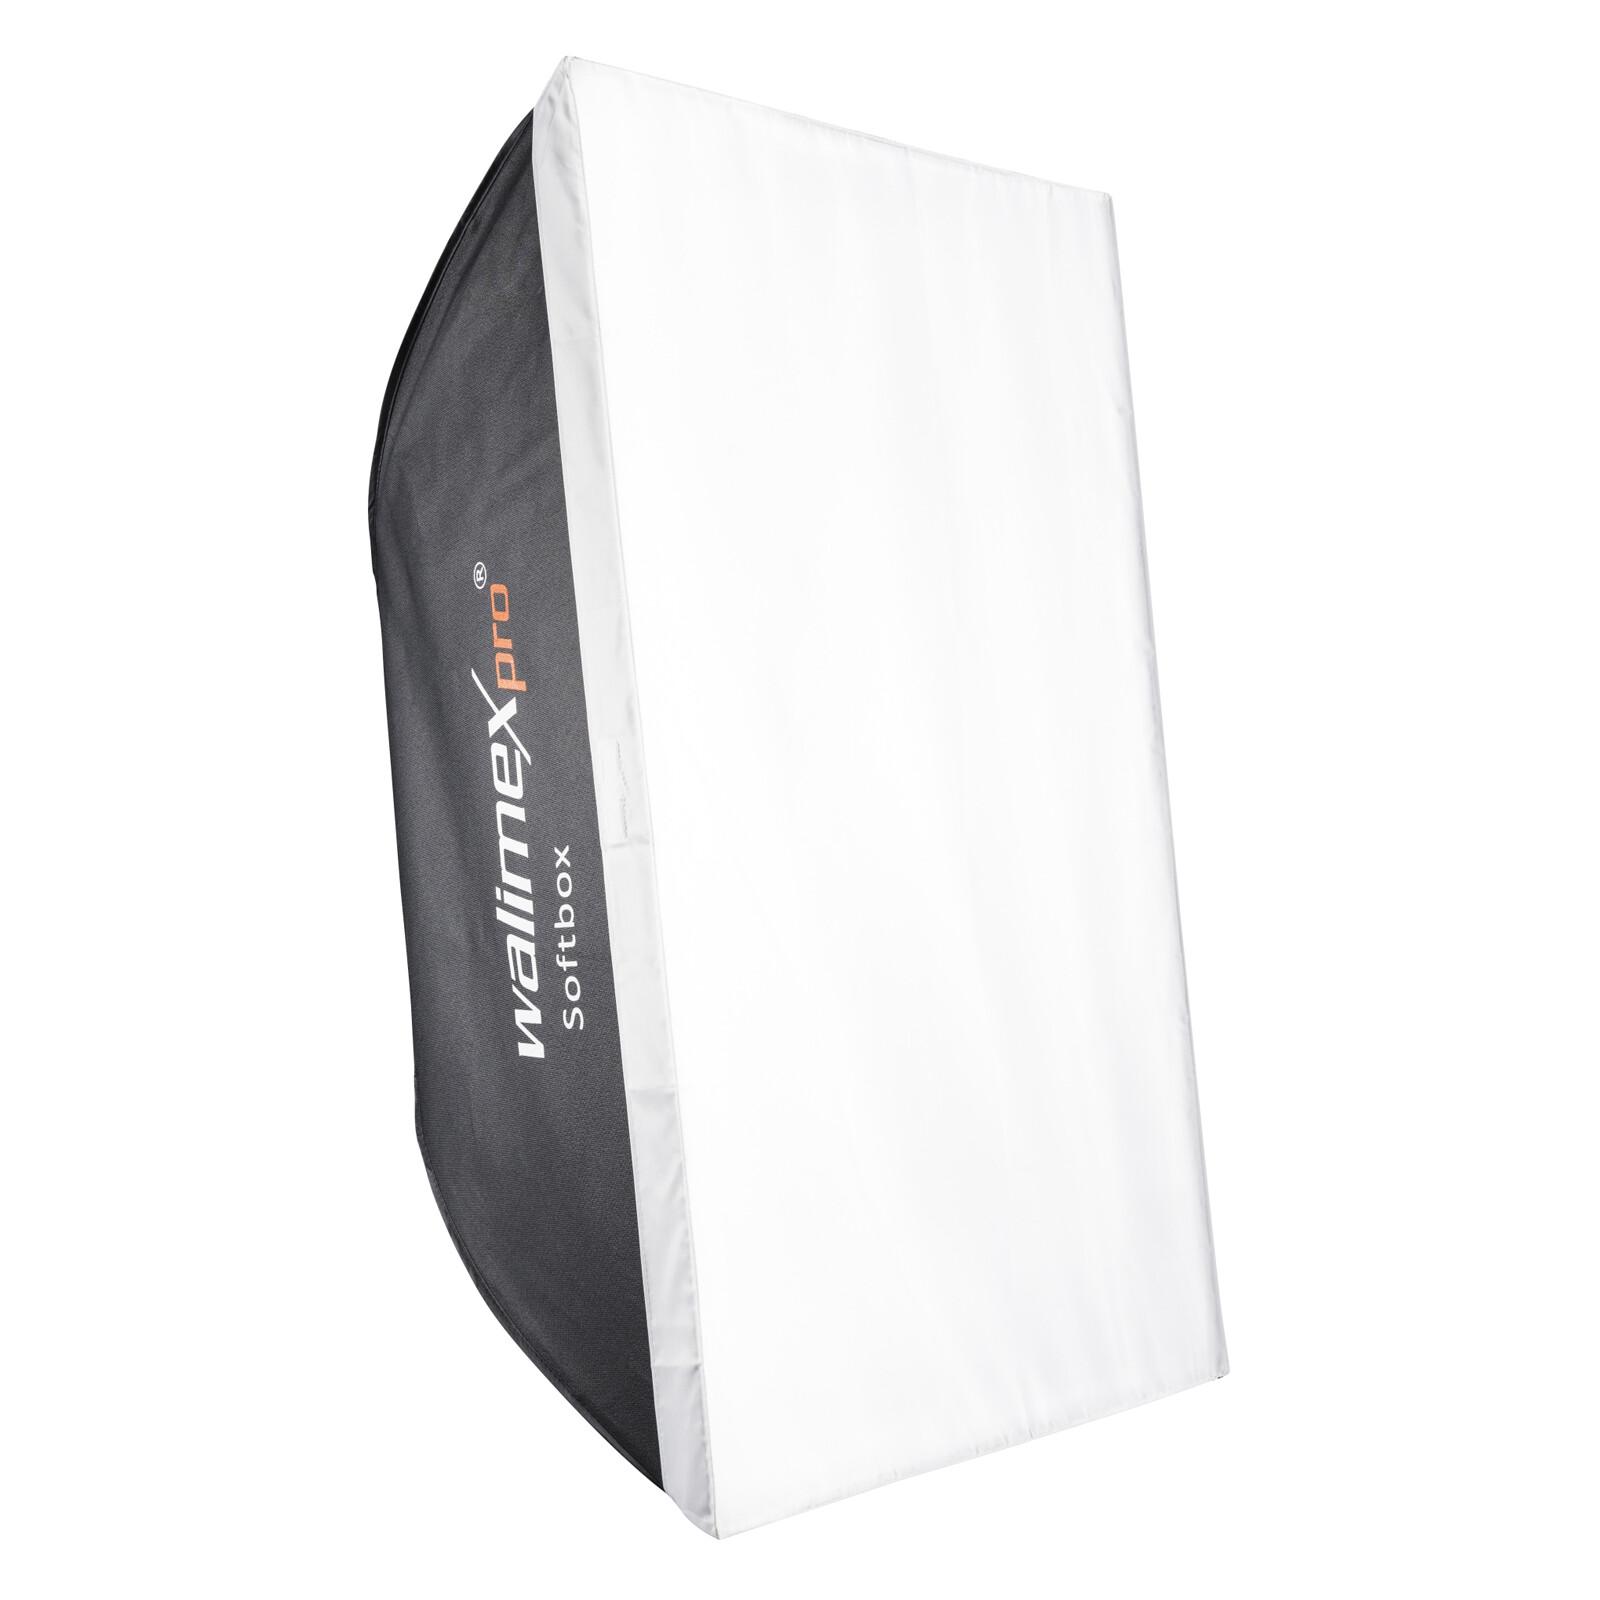 walimex pro Softbox 60x90cm für Elinchrom